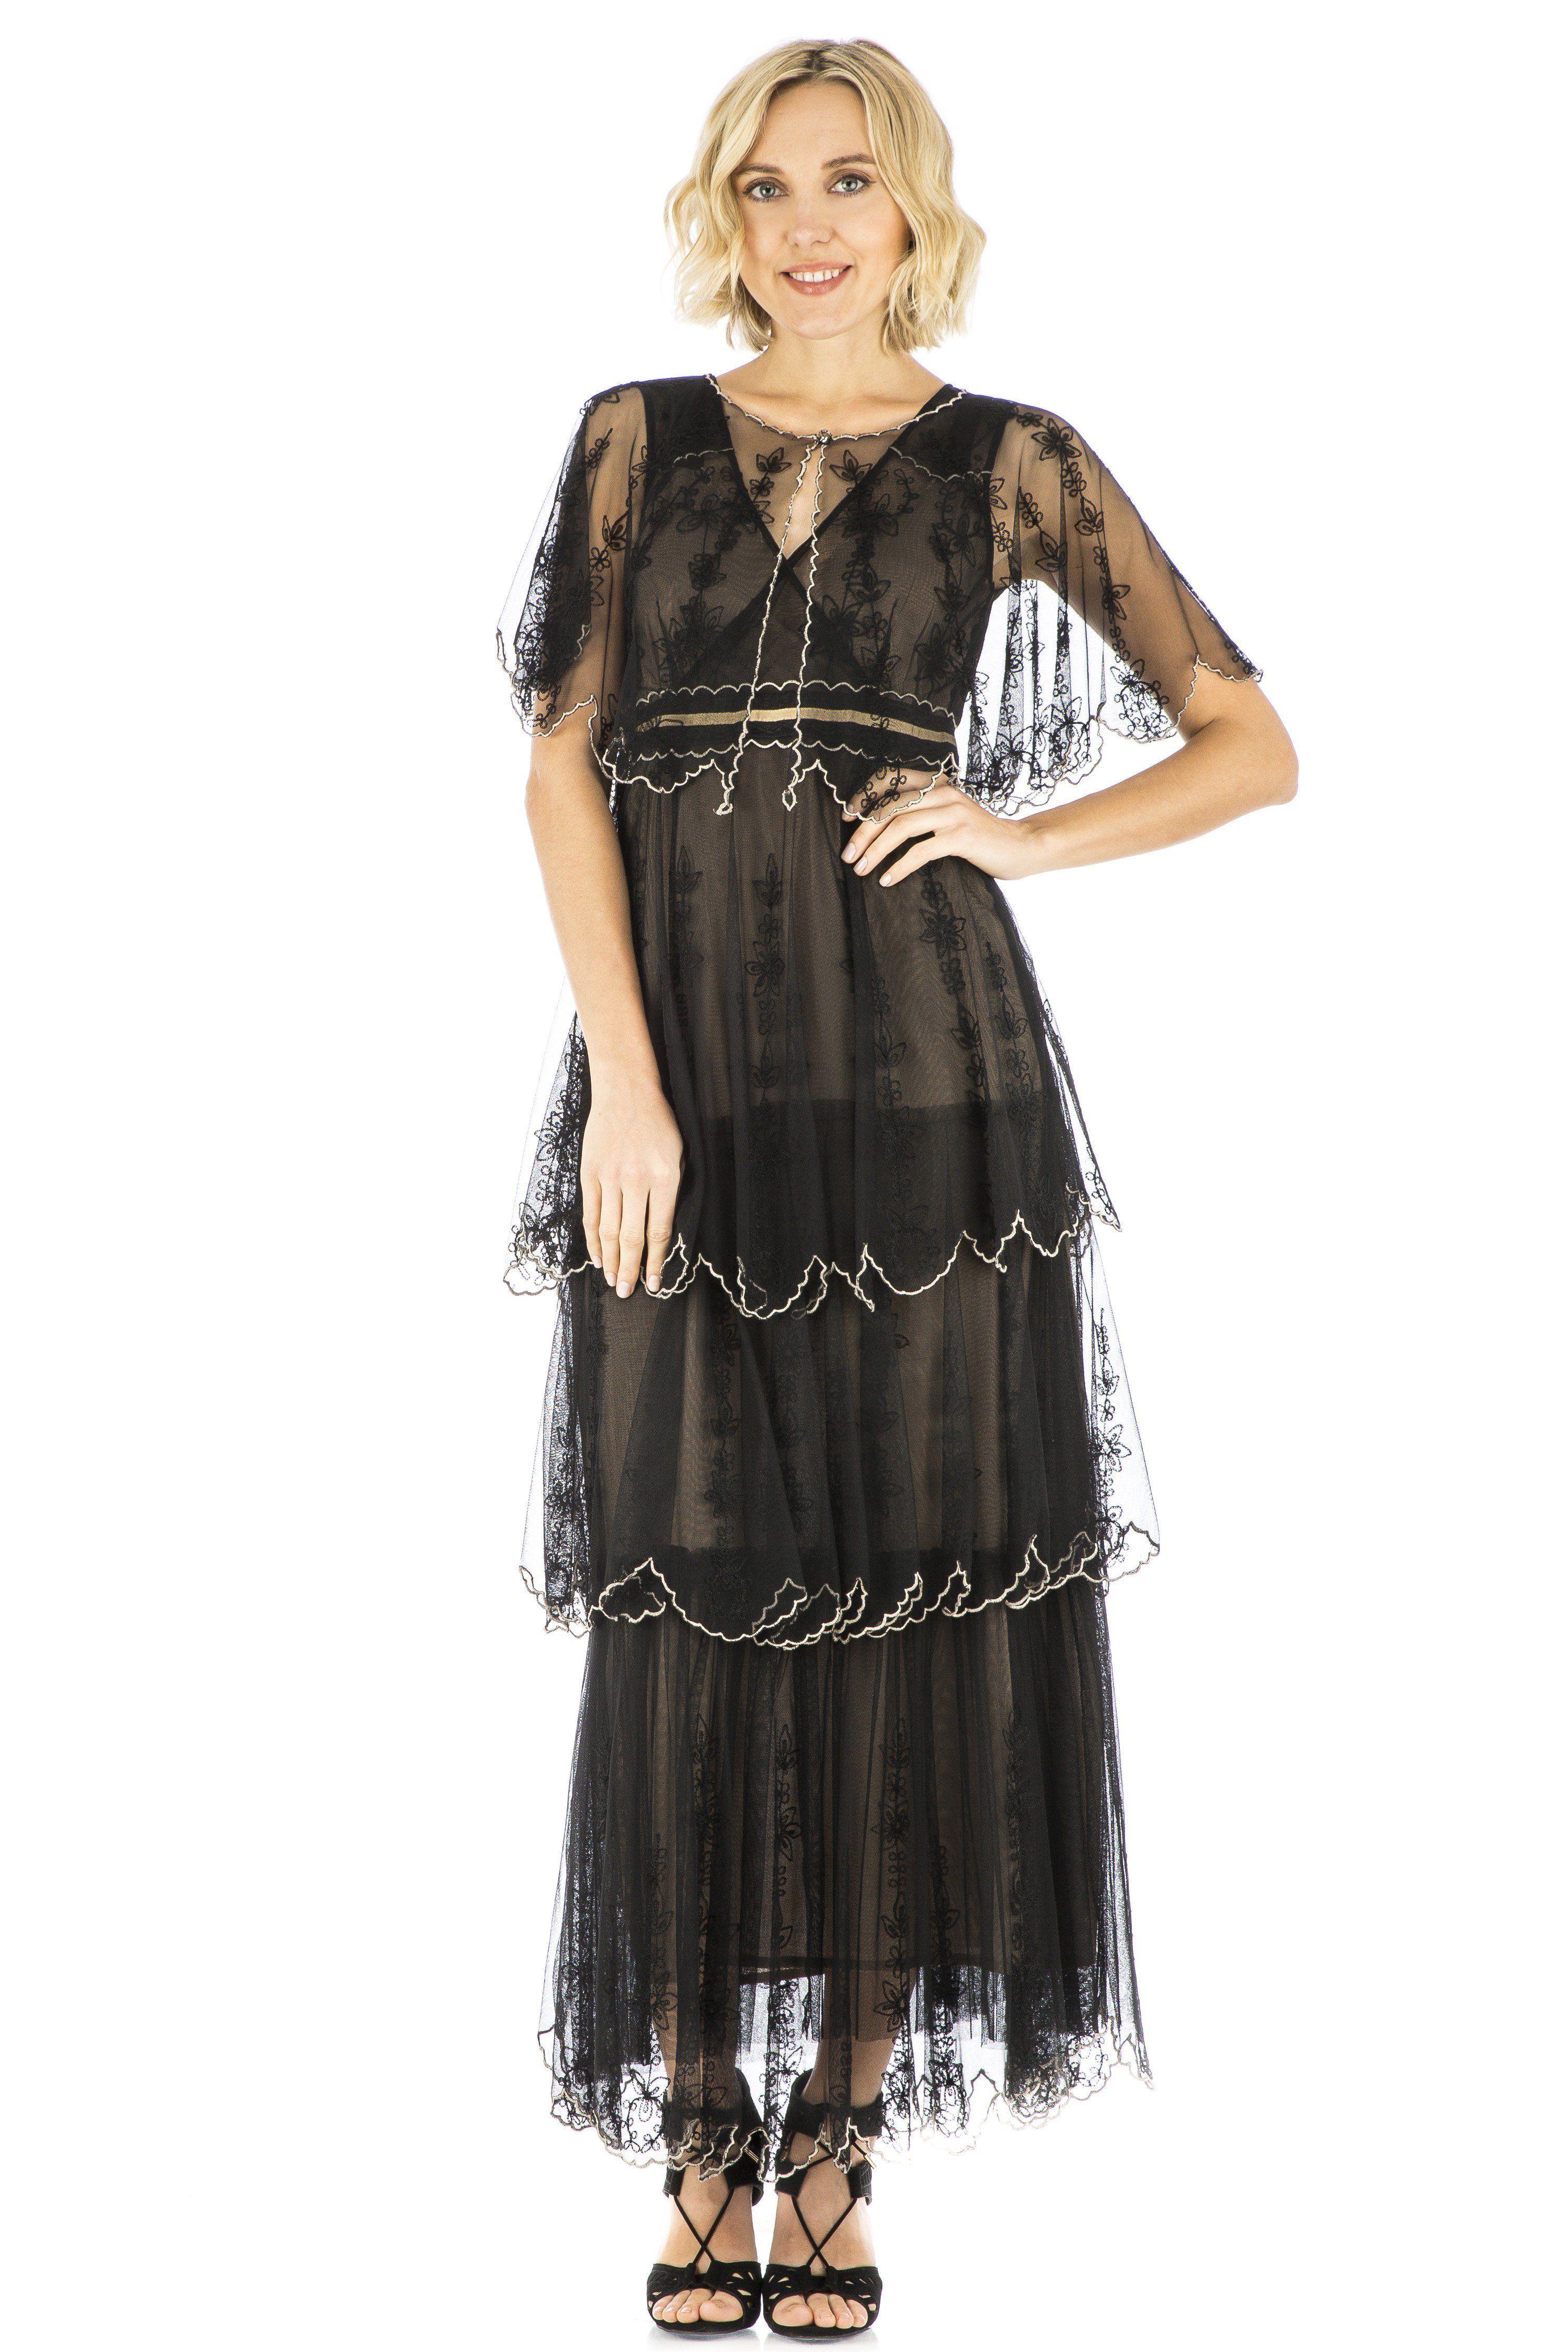 1920s style dresses in 2020 steampunk wedding dress